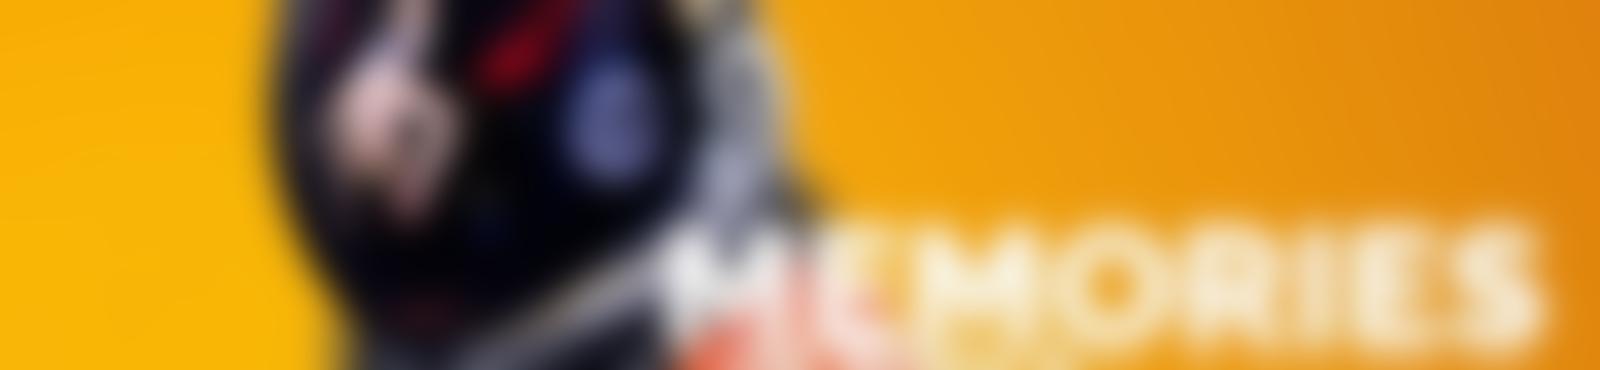 Blurred 811b77c7 7ea5 4b8e b595 2d4abcbfa8db